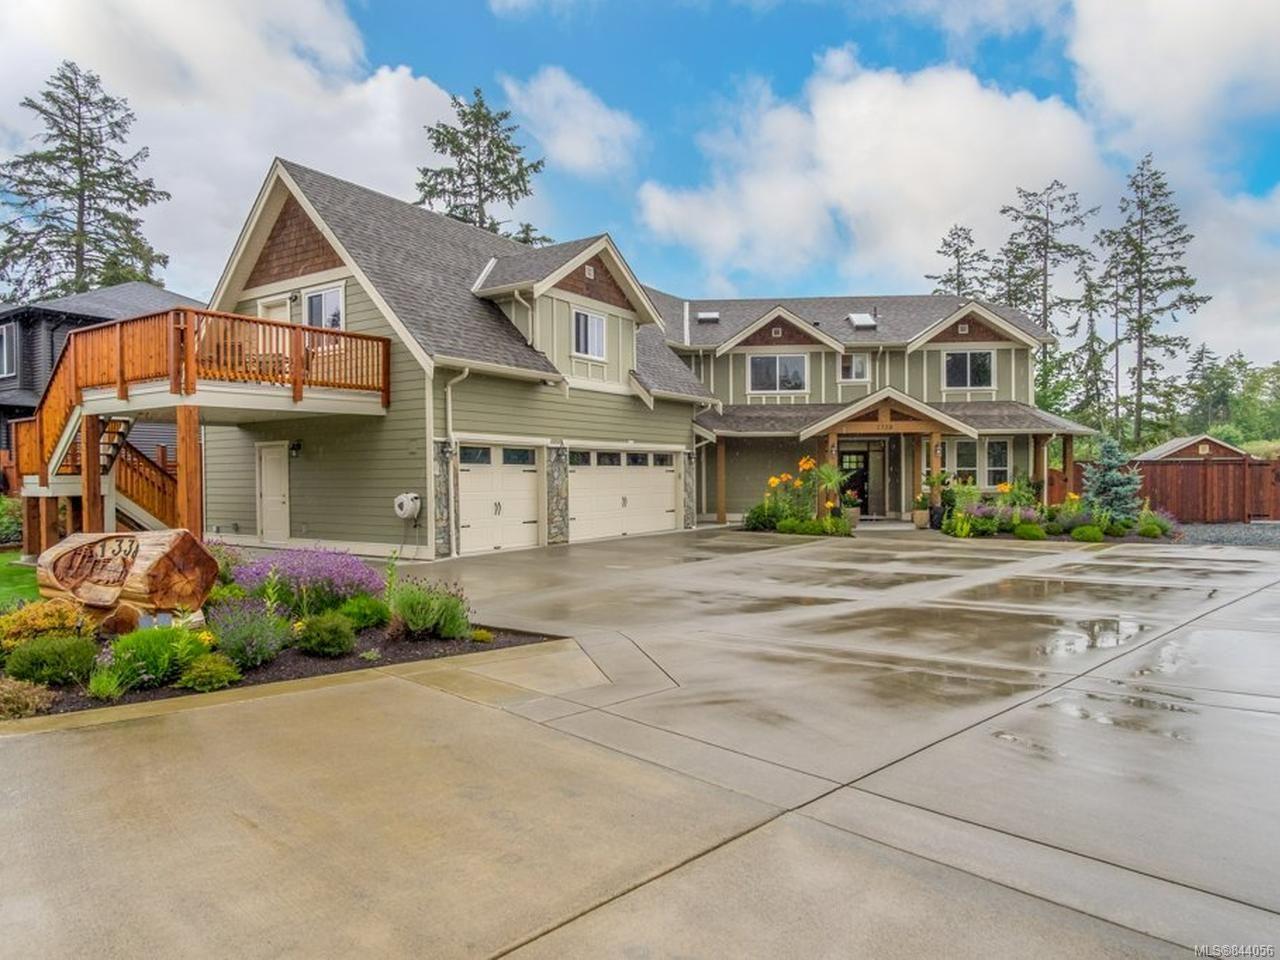 Main Photo: 1338 Blue Heron Cres in NANAIMO: Na Cedar House for sale (Nanaimo)  : MLS®# 844056